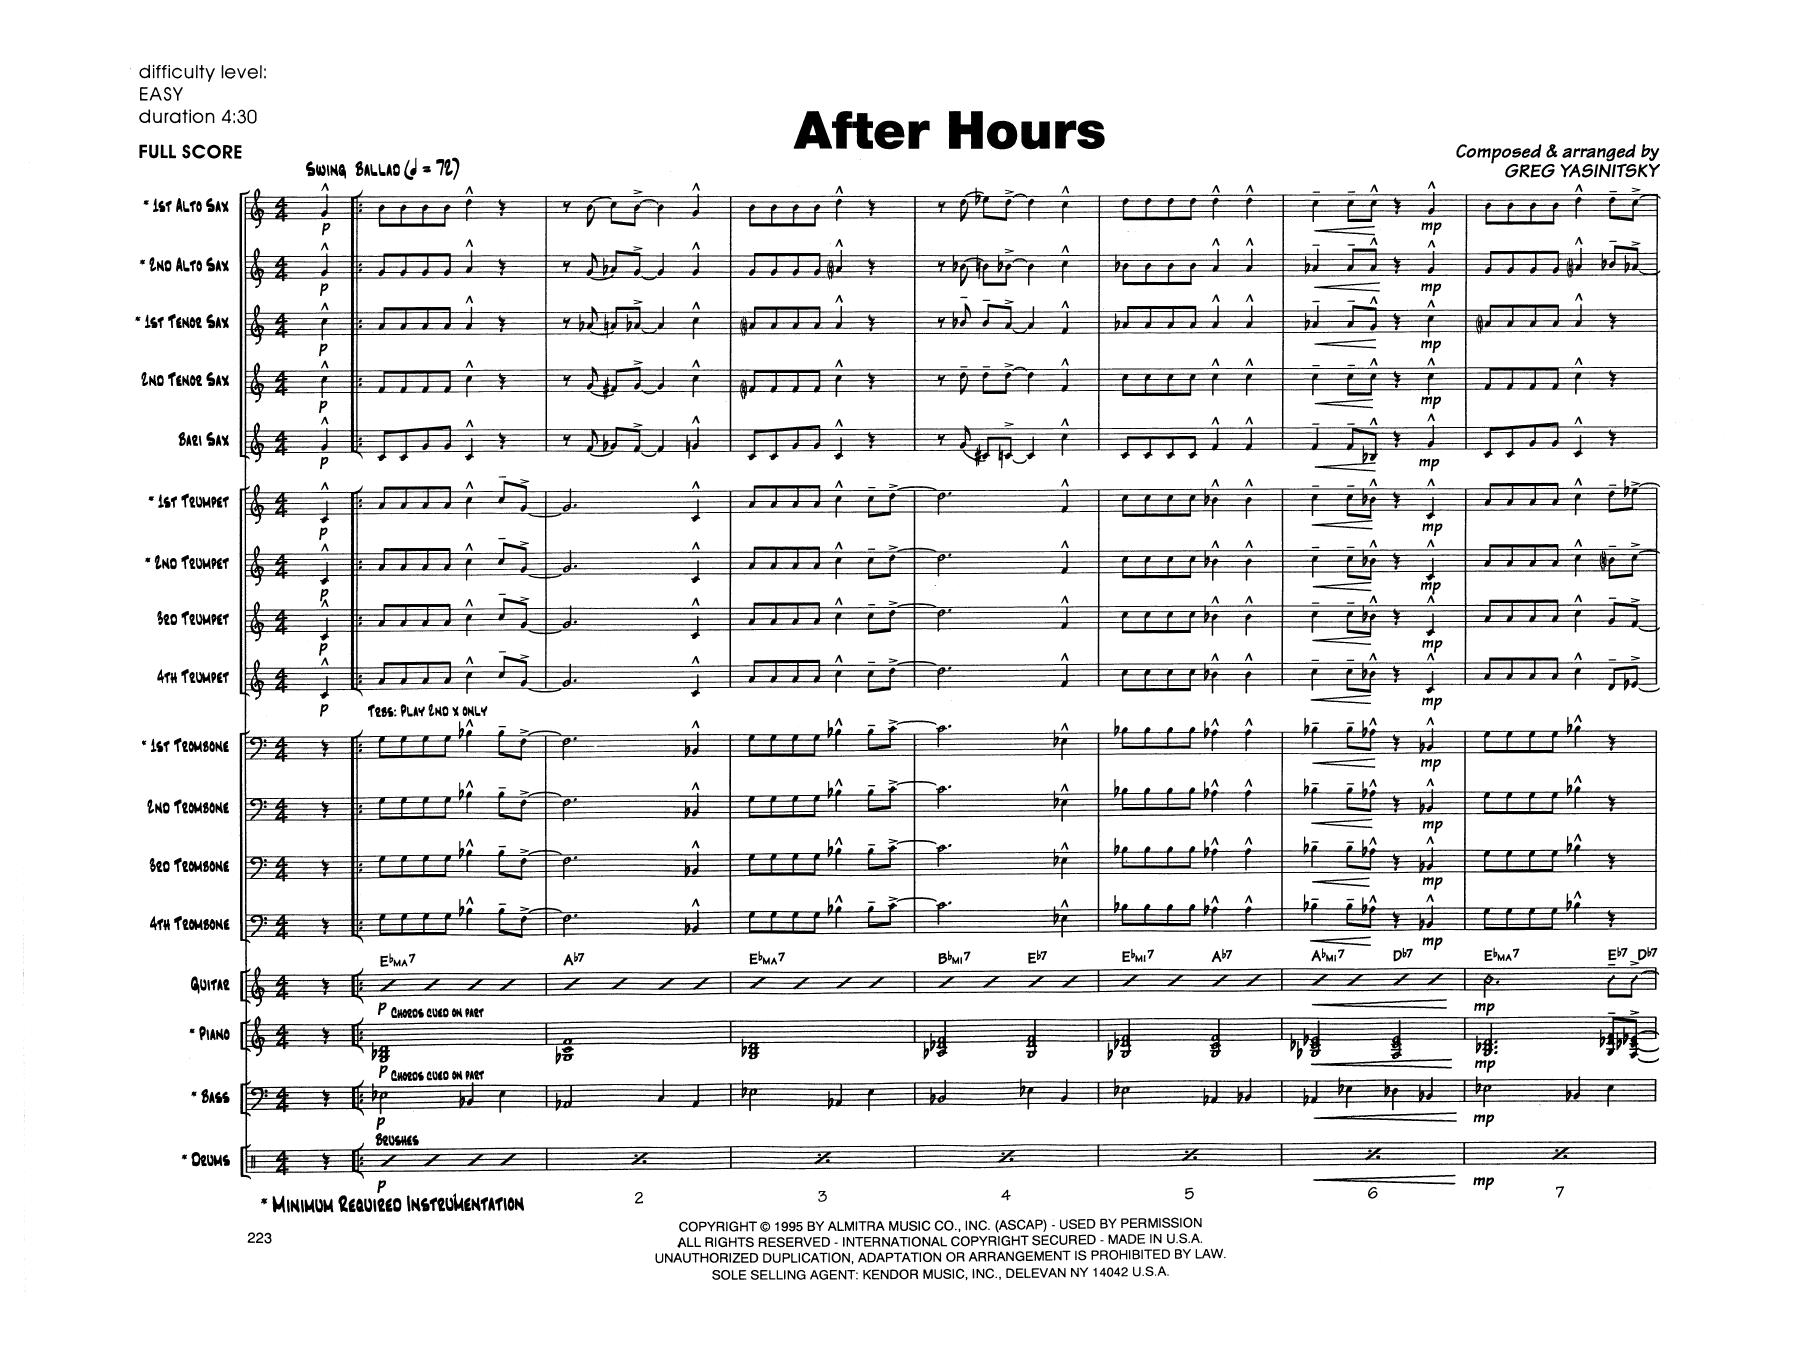 Gregory Yasinitsky After Hours - Full Score sheet music notes printable PDF score